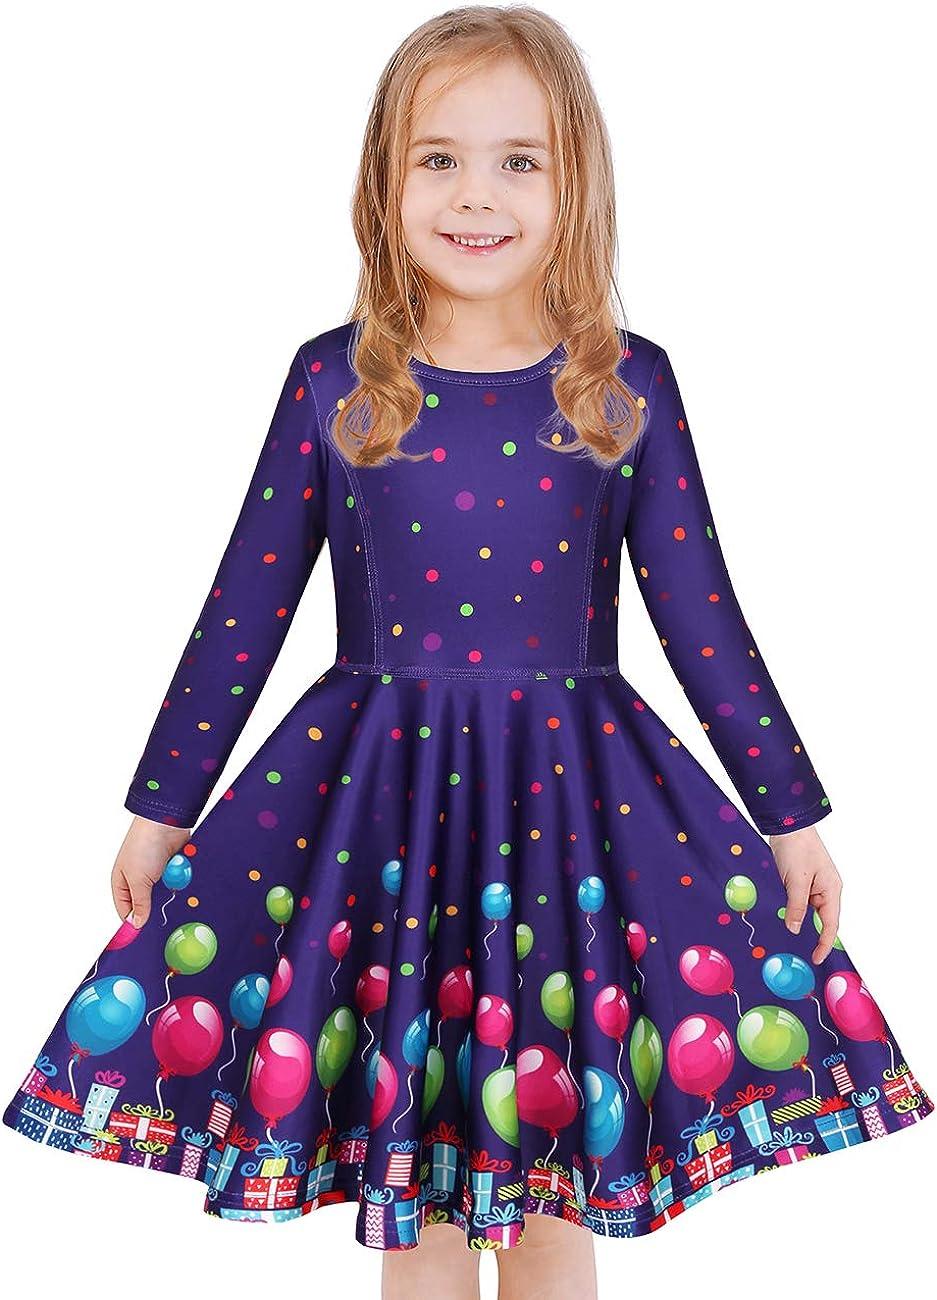 Large-scale sale LaBeca Girls Dress Sleeveless Long Little Bi Manufacturer regenerated product Sleeve Kids Toddler